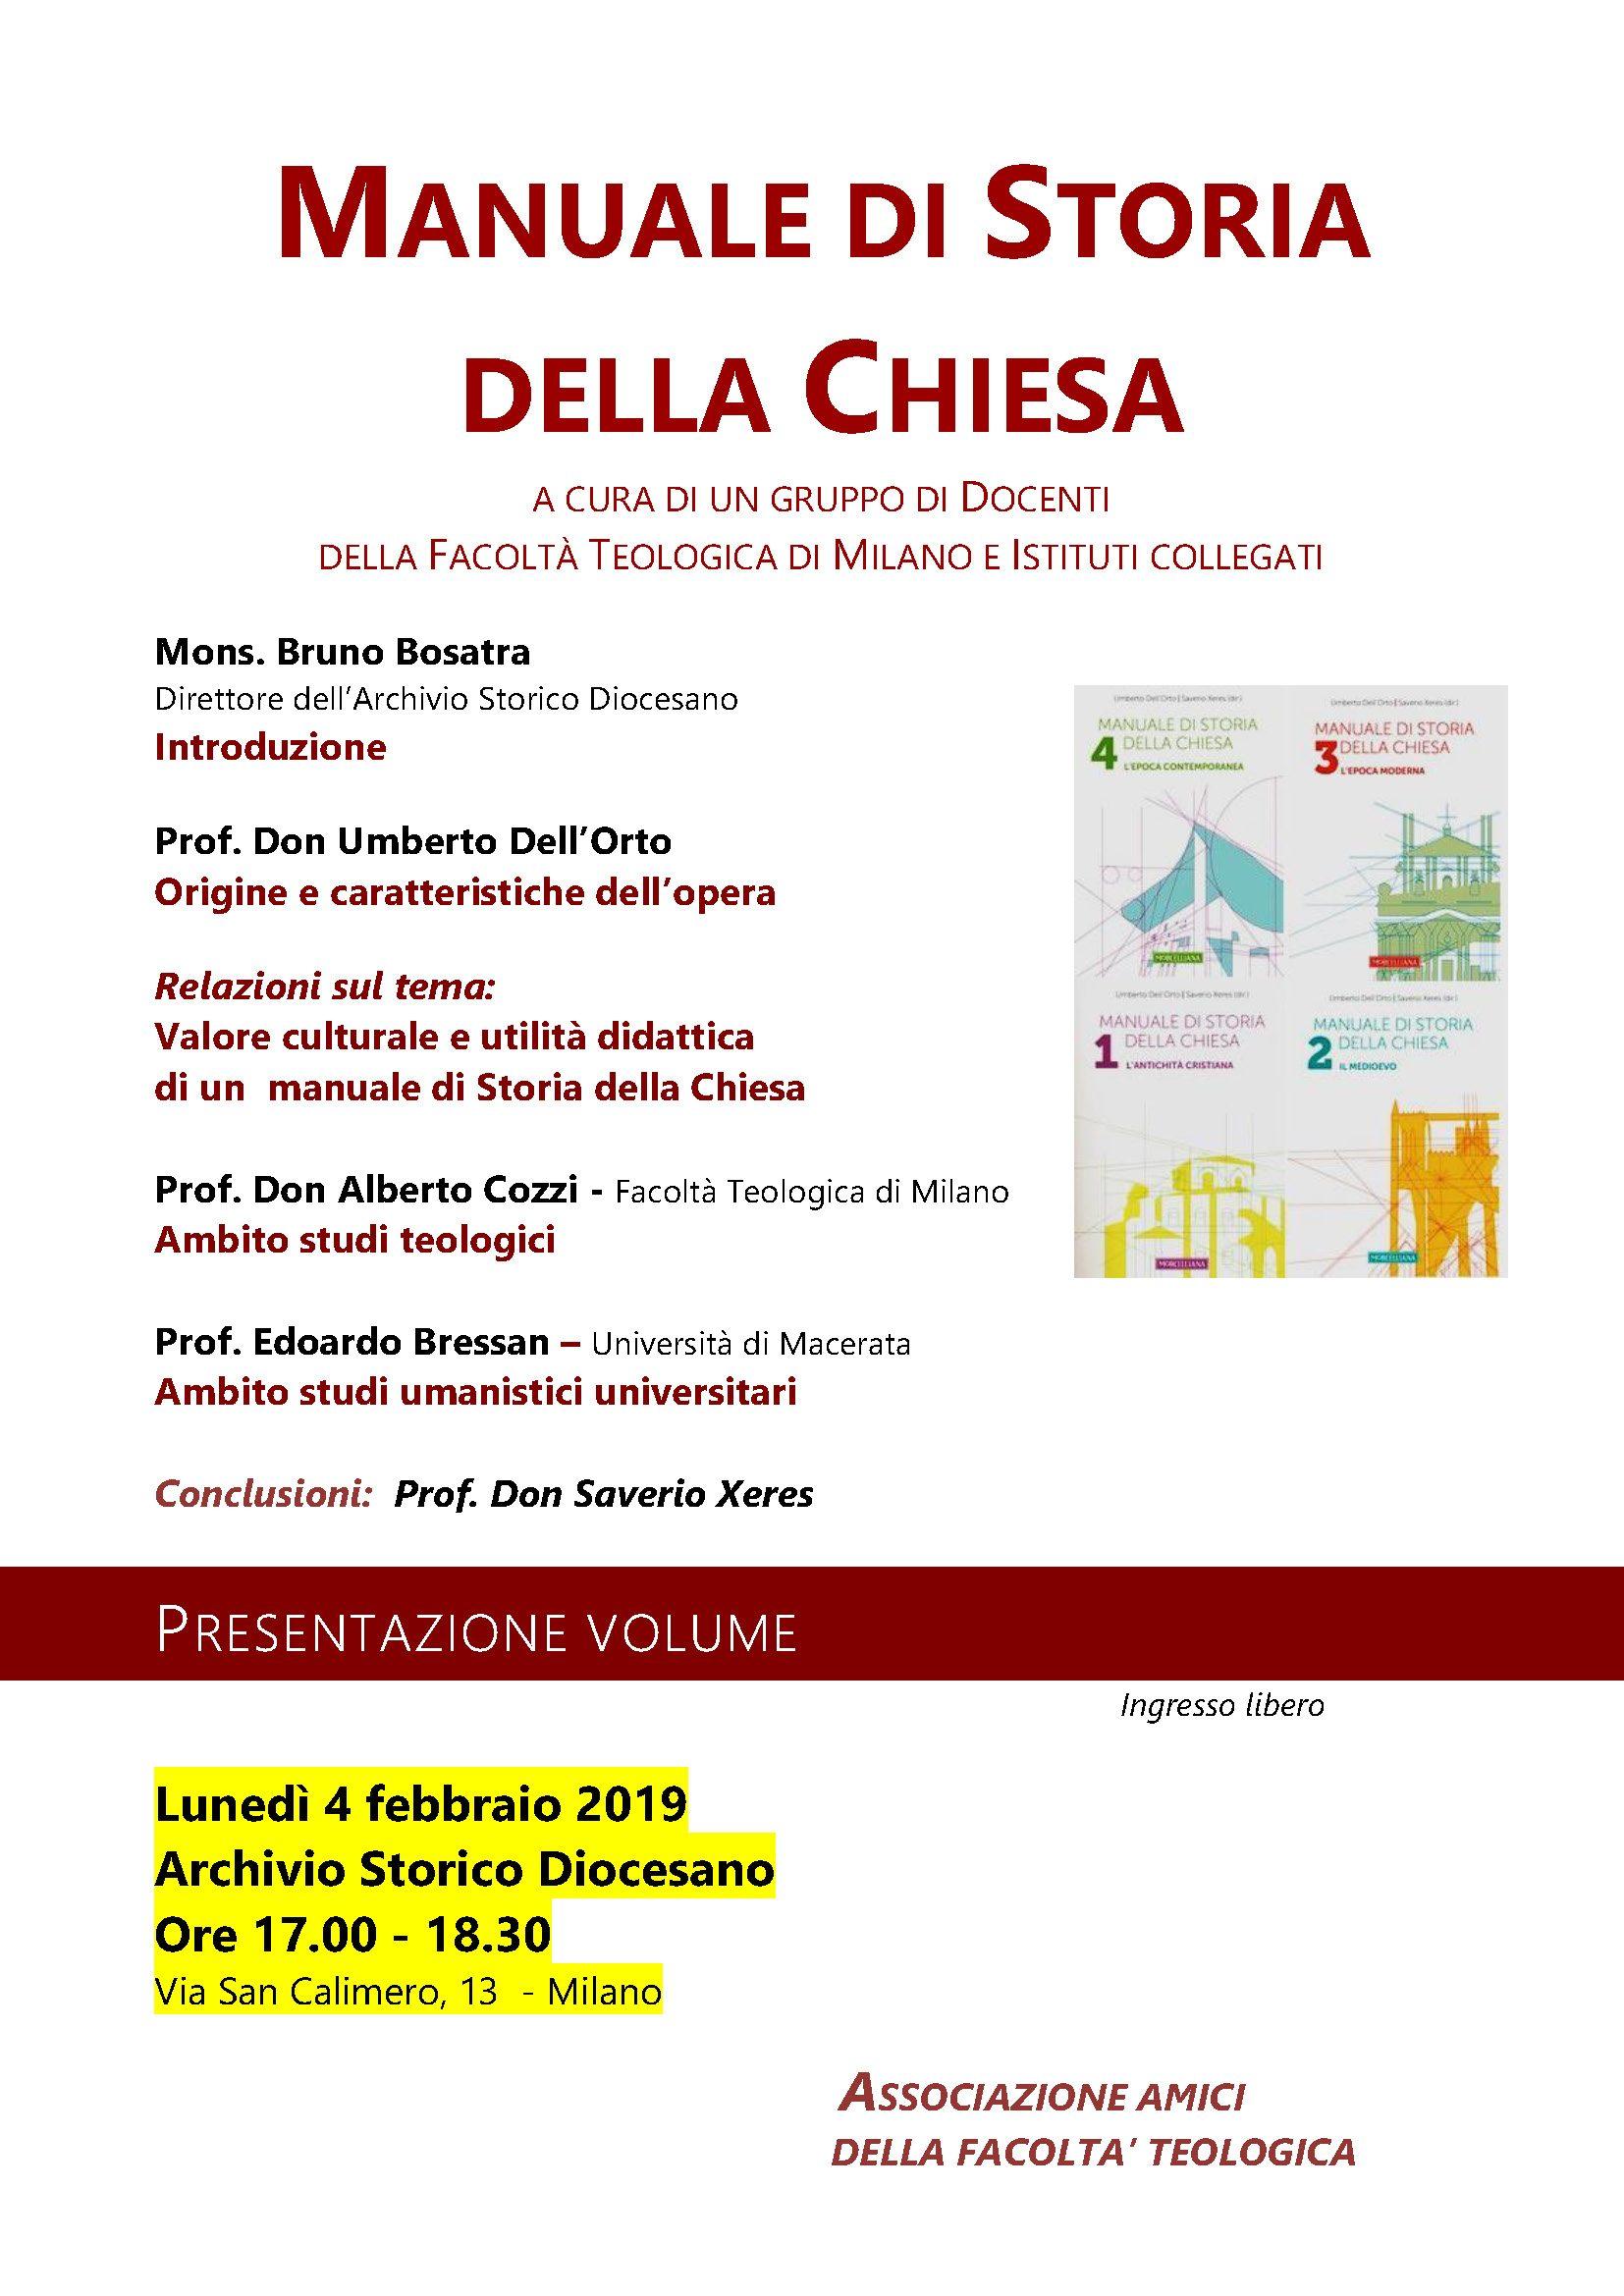 Milano-4 febbraio manuali storia chiesa.